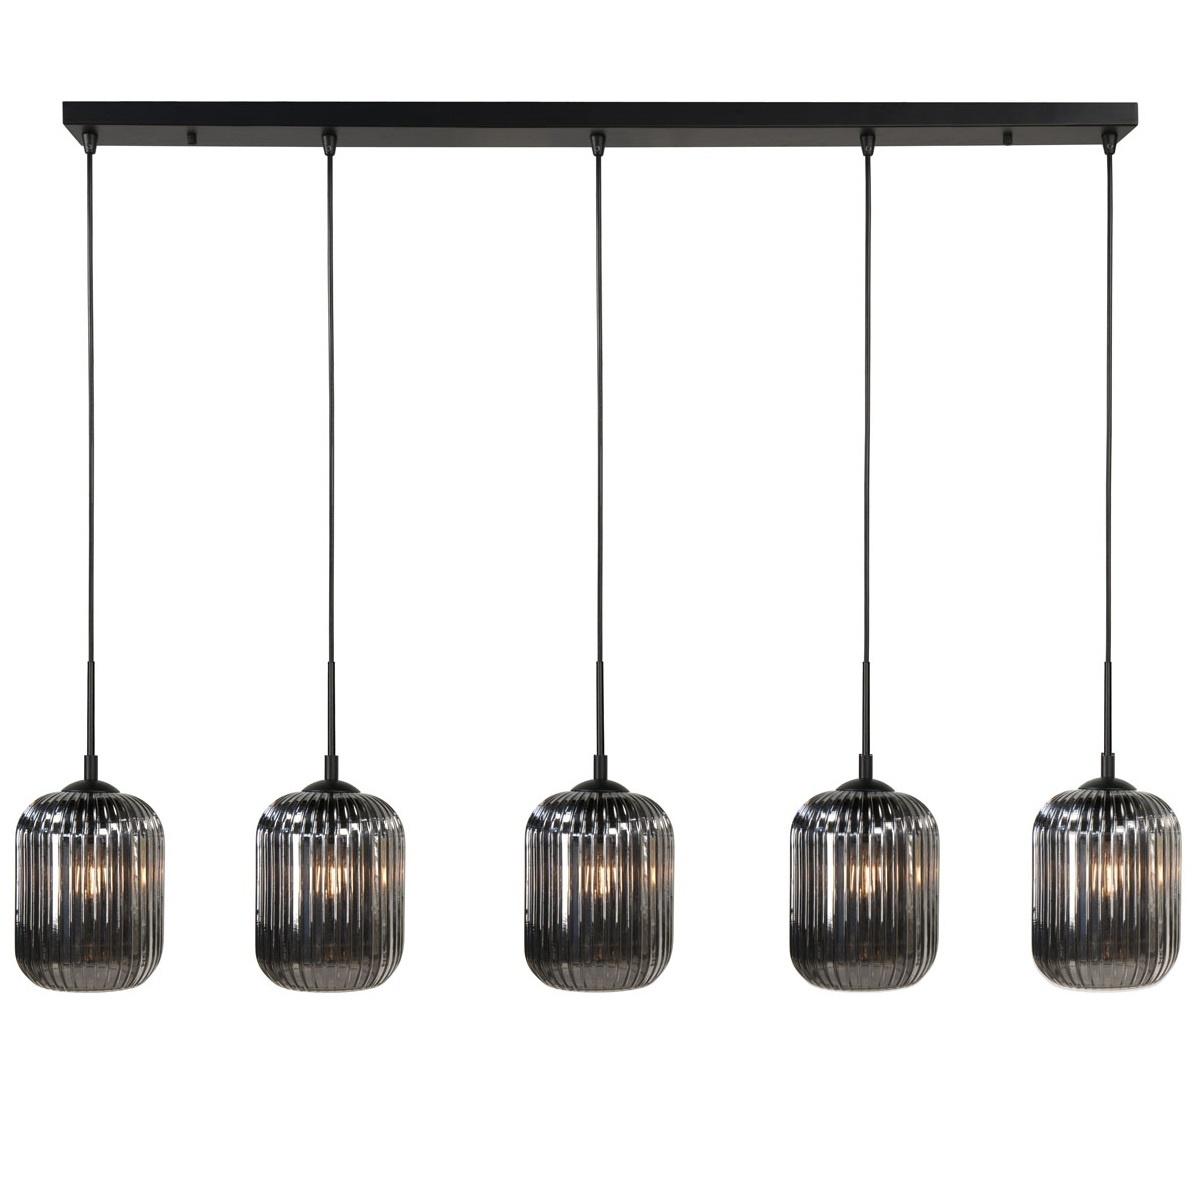 Hanglamp Castel Smoke 5 Lichts 120cm |  | 8718379036804